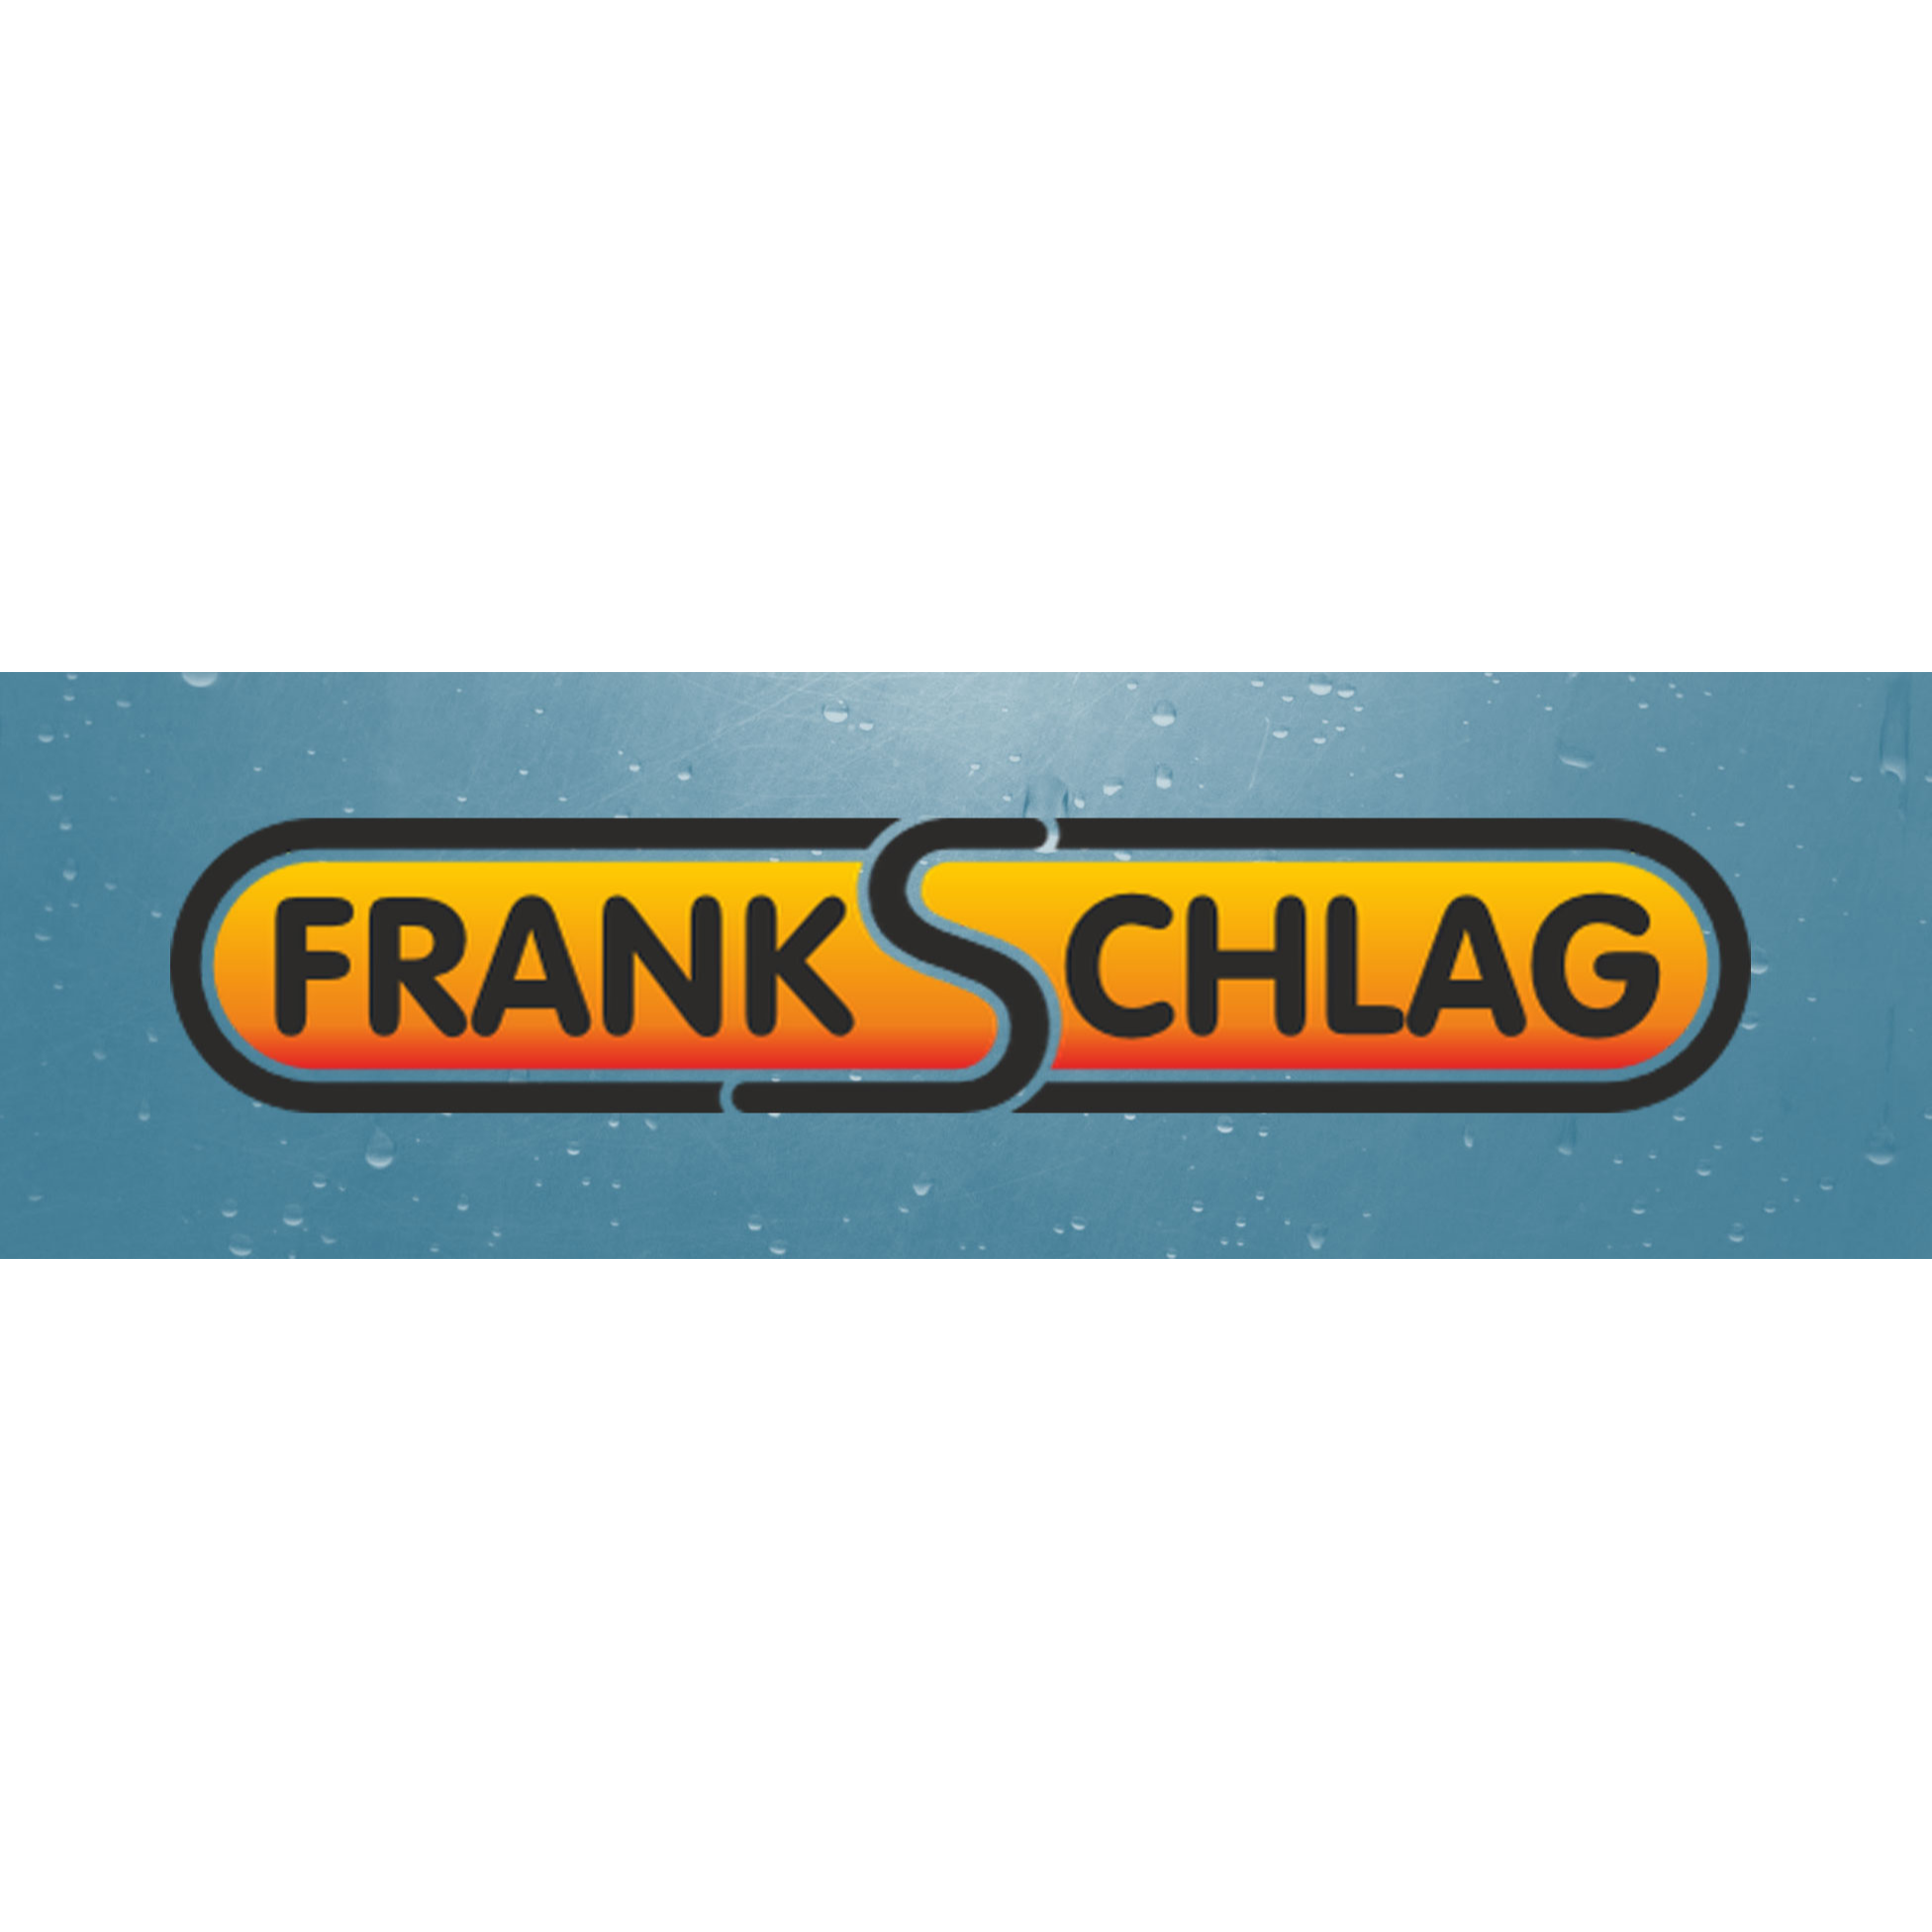 Frank Schlag GmbH & Co. KG